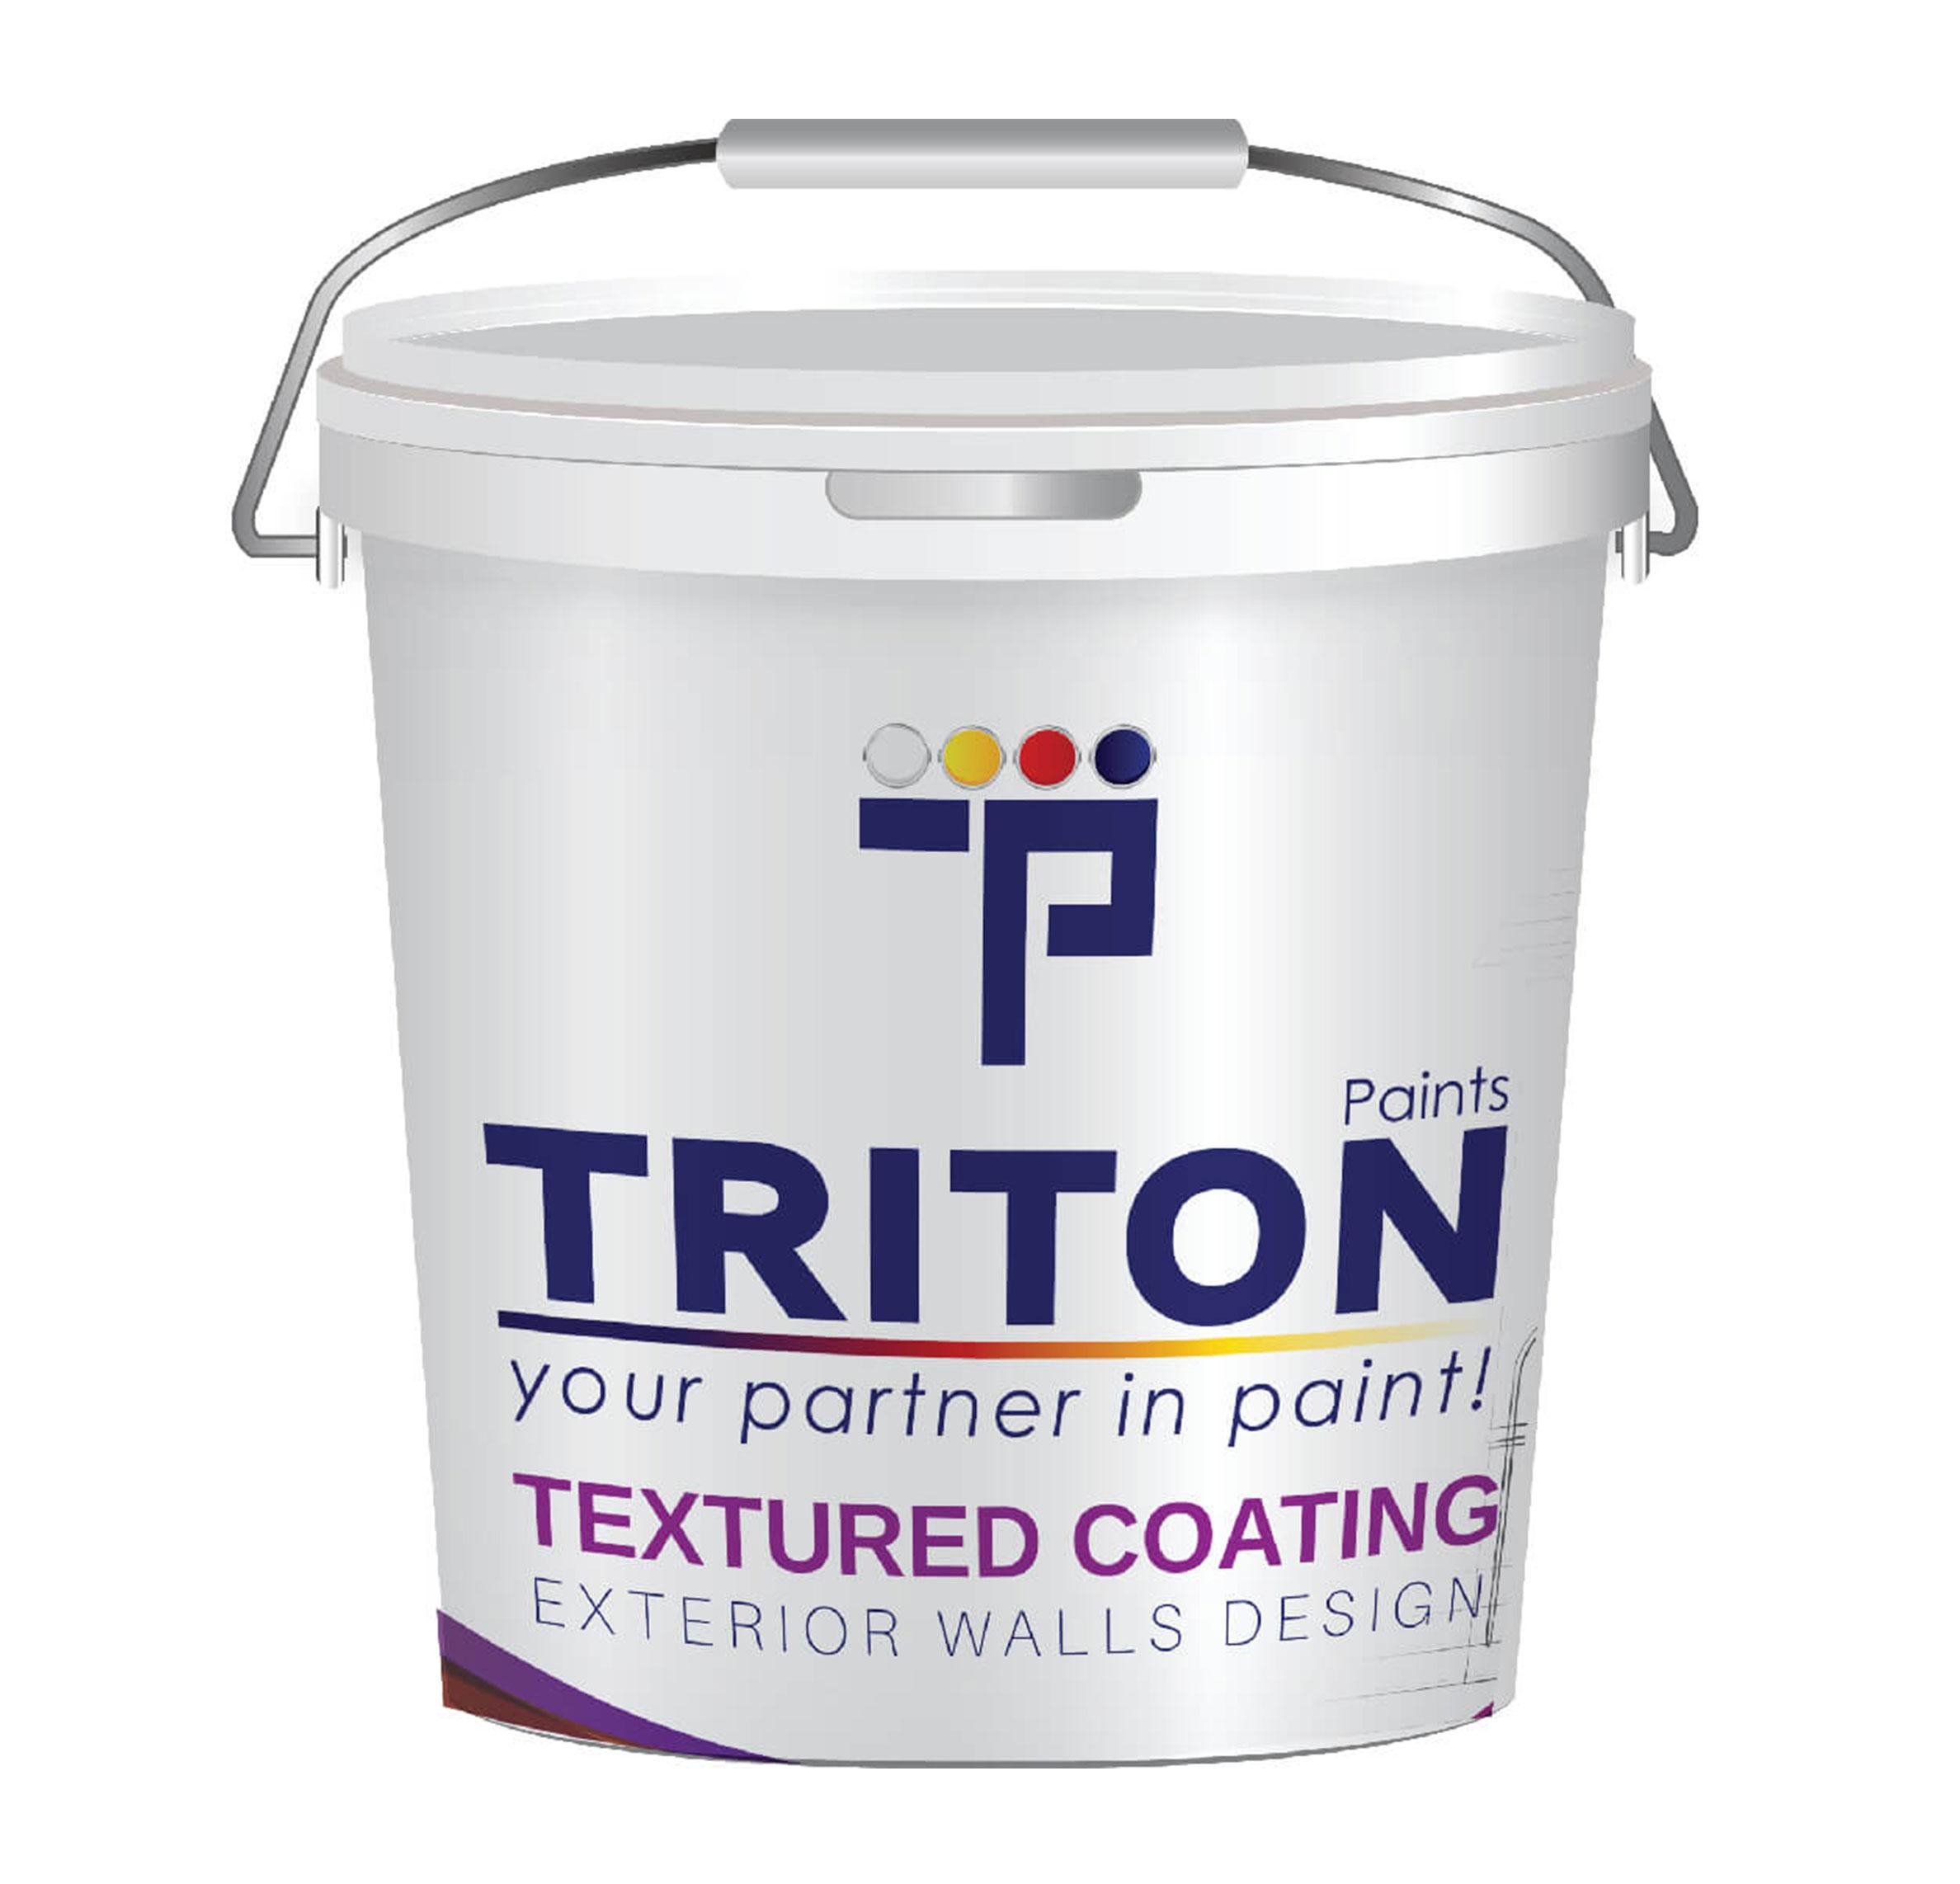 Textured coating